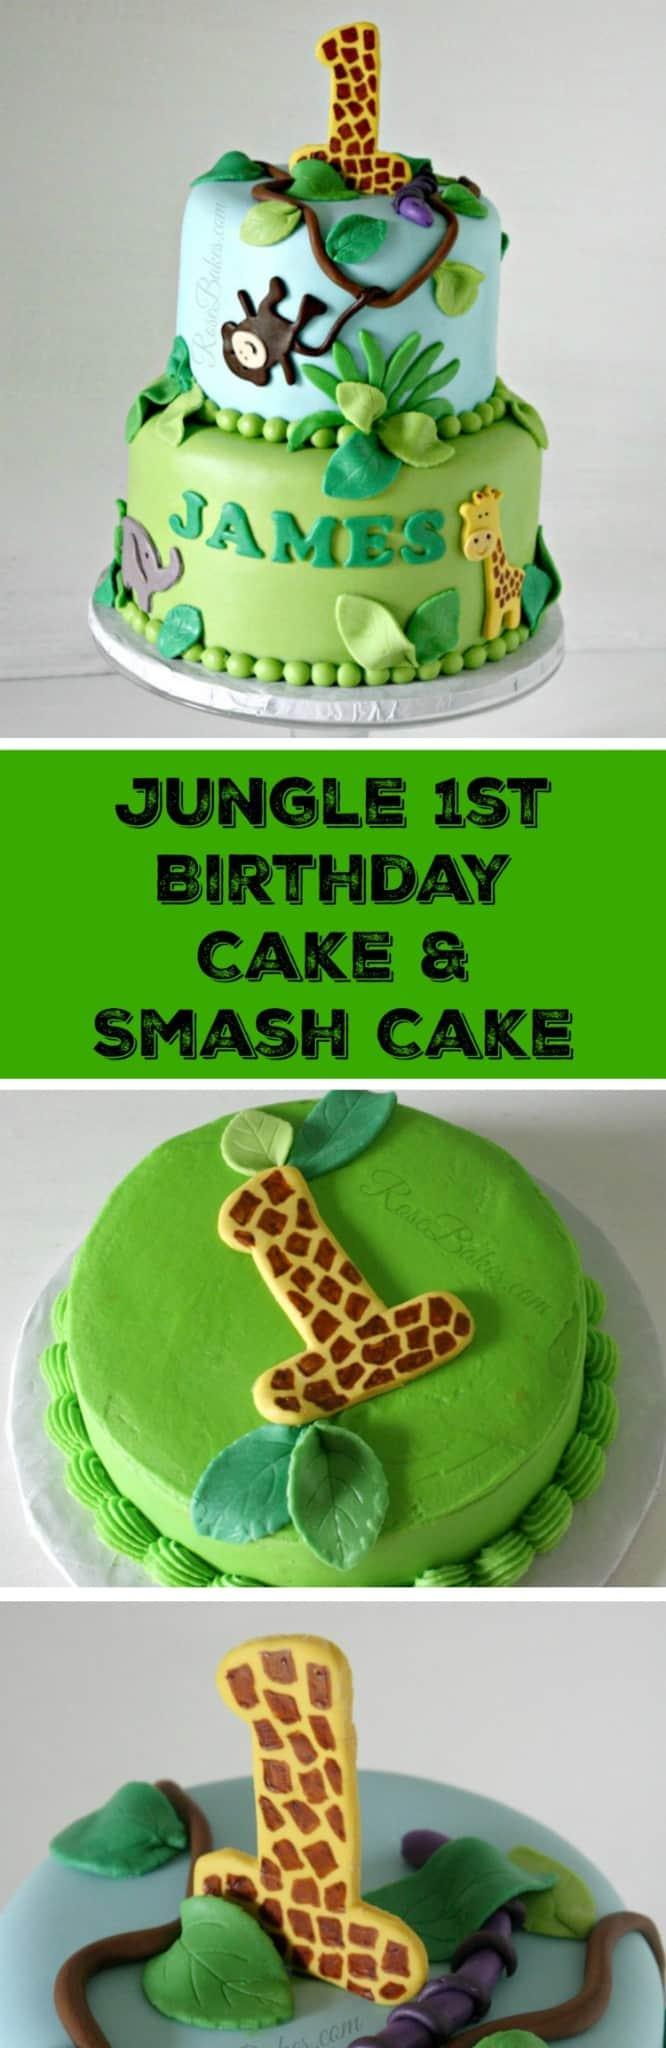 Fine Jungle 1St Birthday Cake Smash Cake Rose Bakes Personalised Birthday Cards Bromeletsinfo